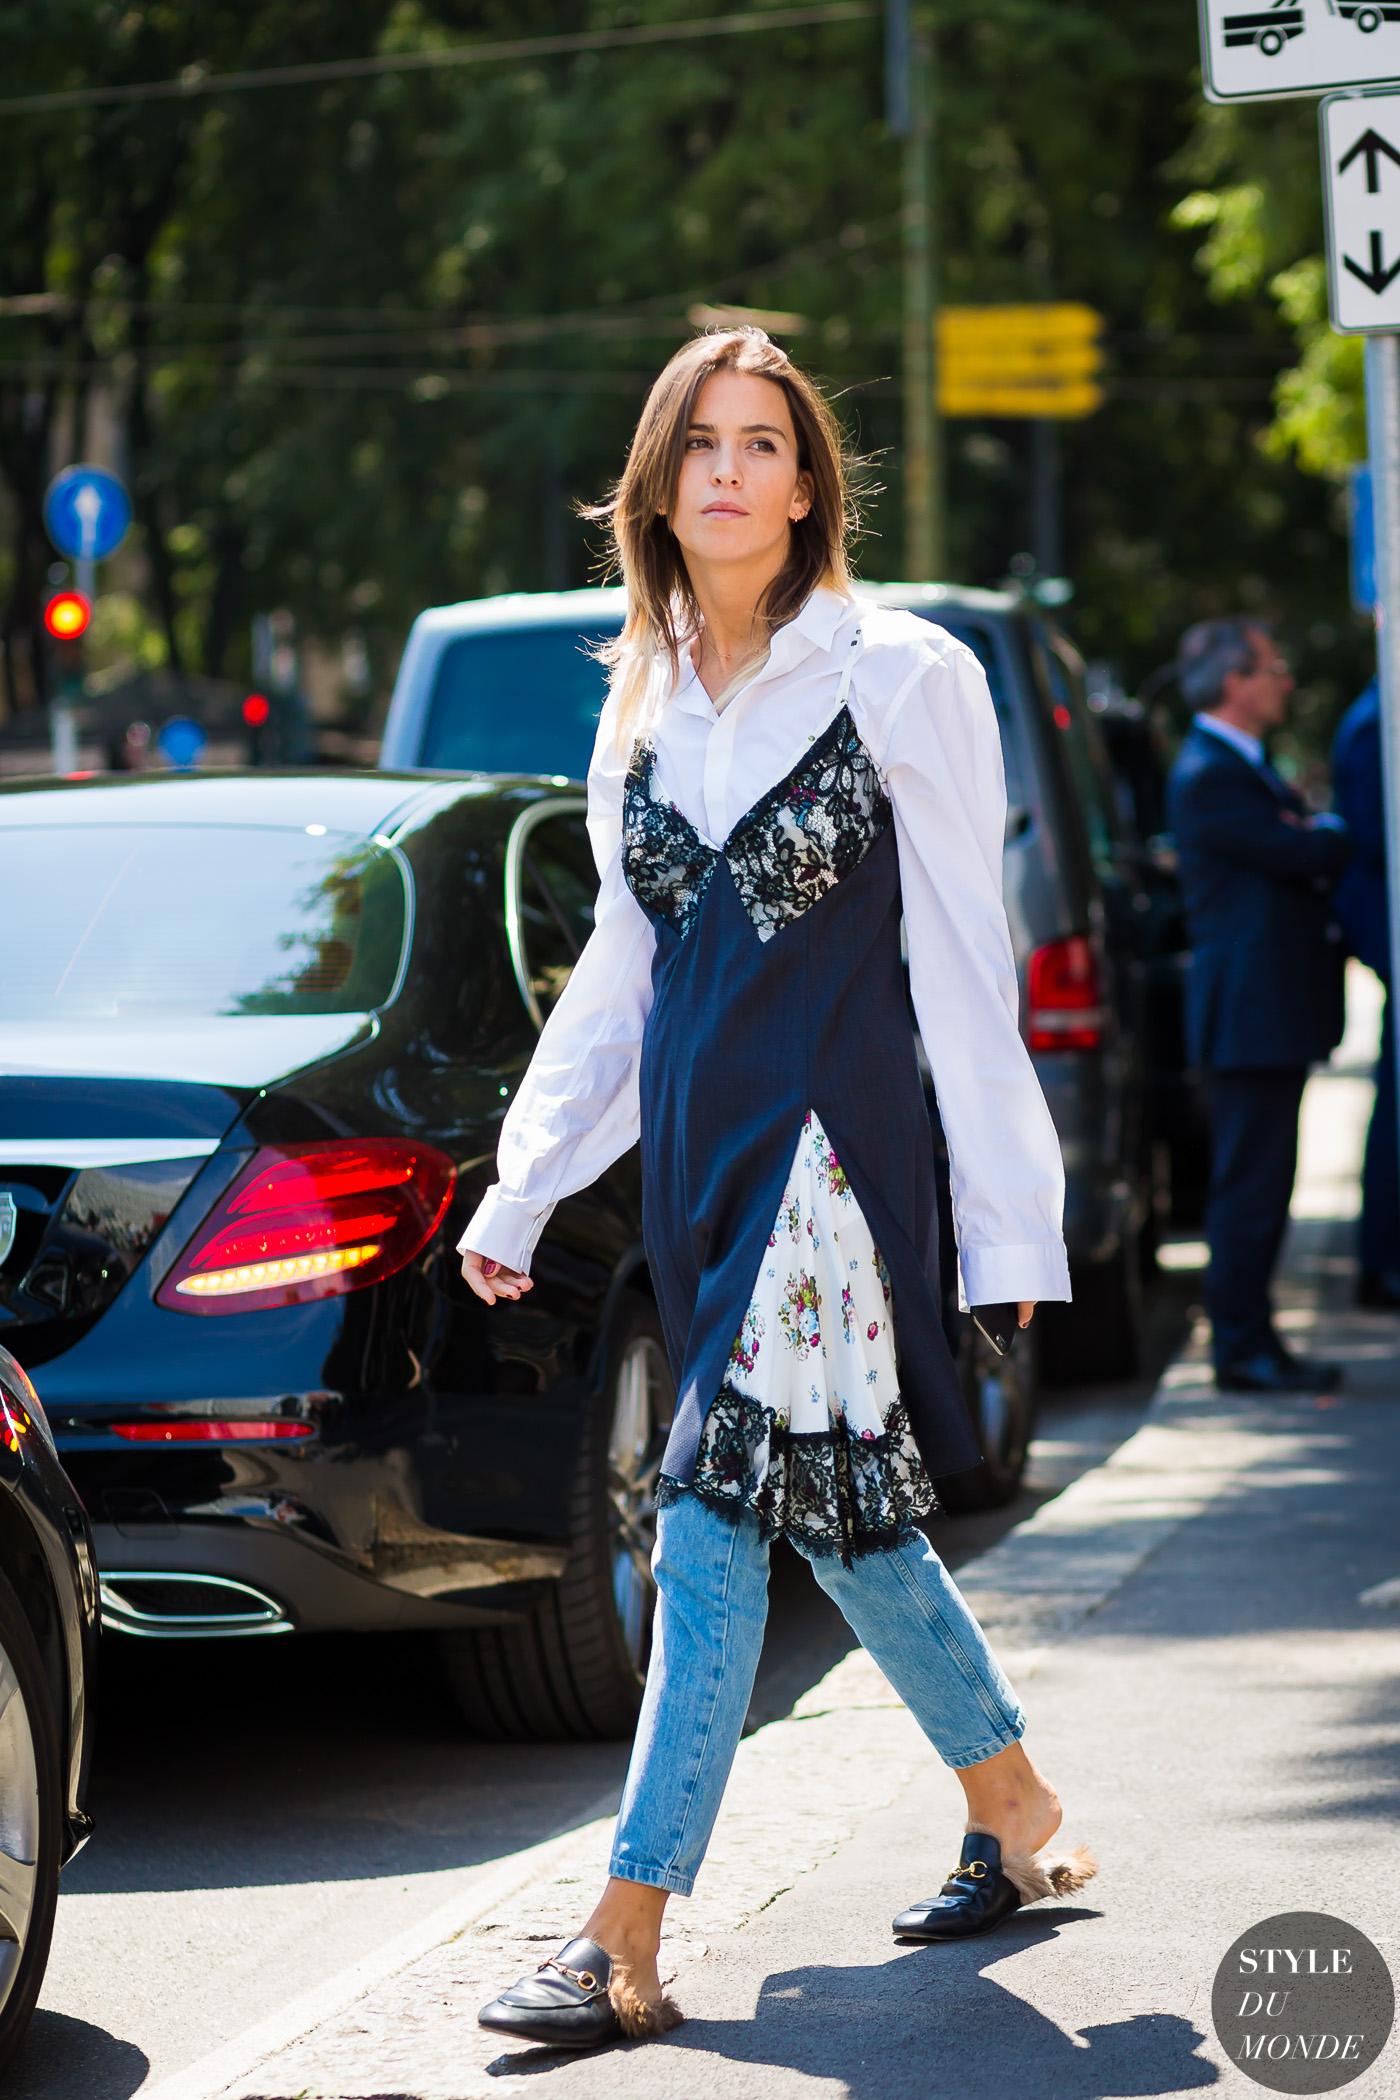 carola-bernard-by-styledumonde-street-style-fashion-photography0e2a7490-700x10502x